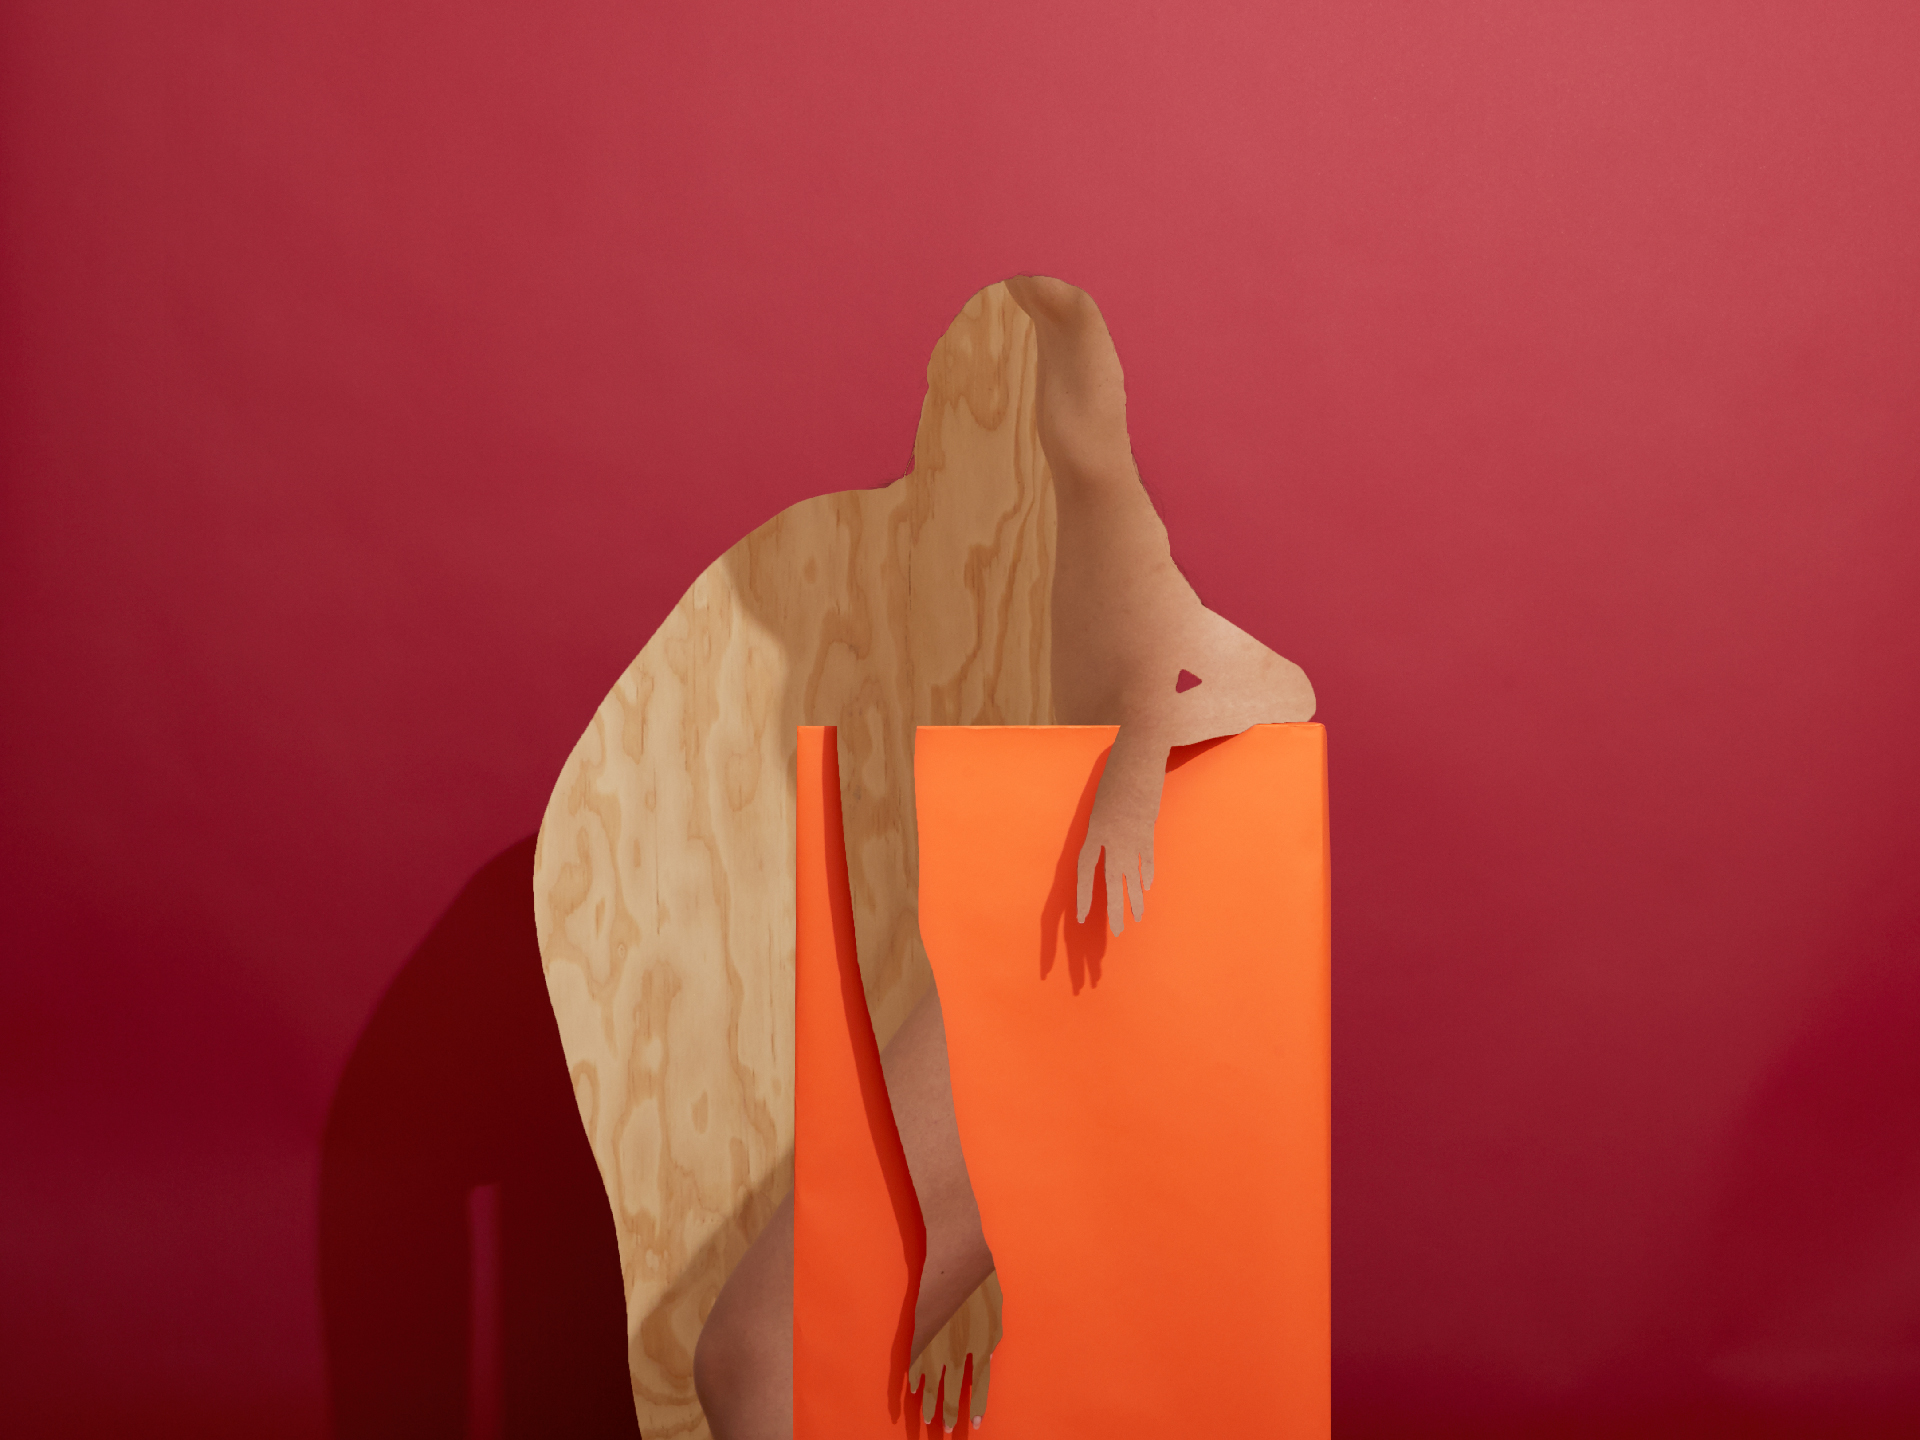 Kara, Crimson, Marmalade, and Plywood  2016